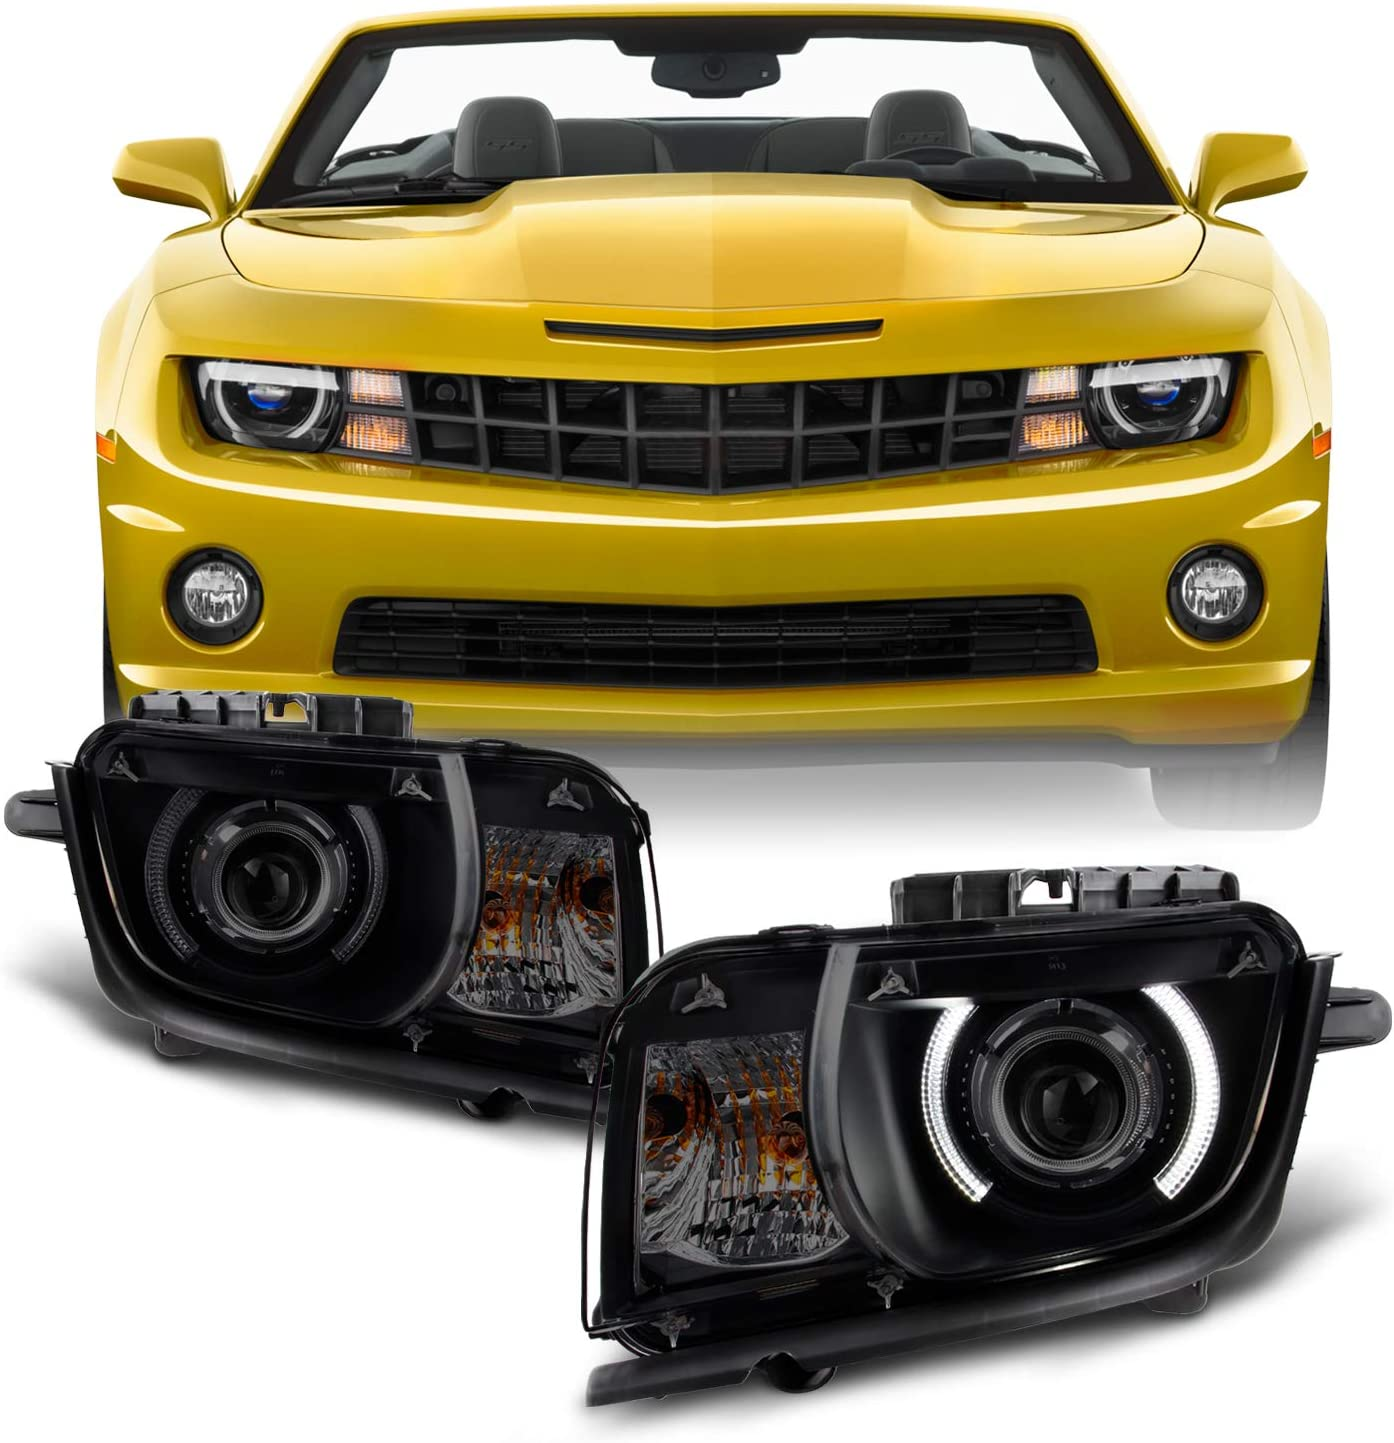 Amazon Com For Black Smoked 2010 2011 2012 2013 Chevy Camaro Driver Passenger Both Side Projector Headlights Set Automotive